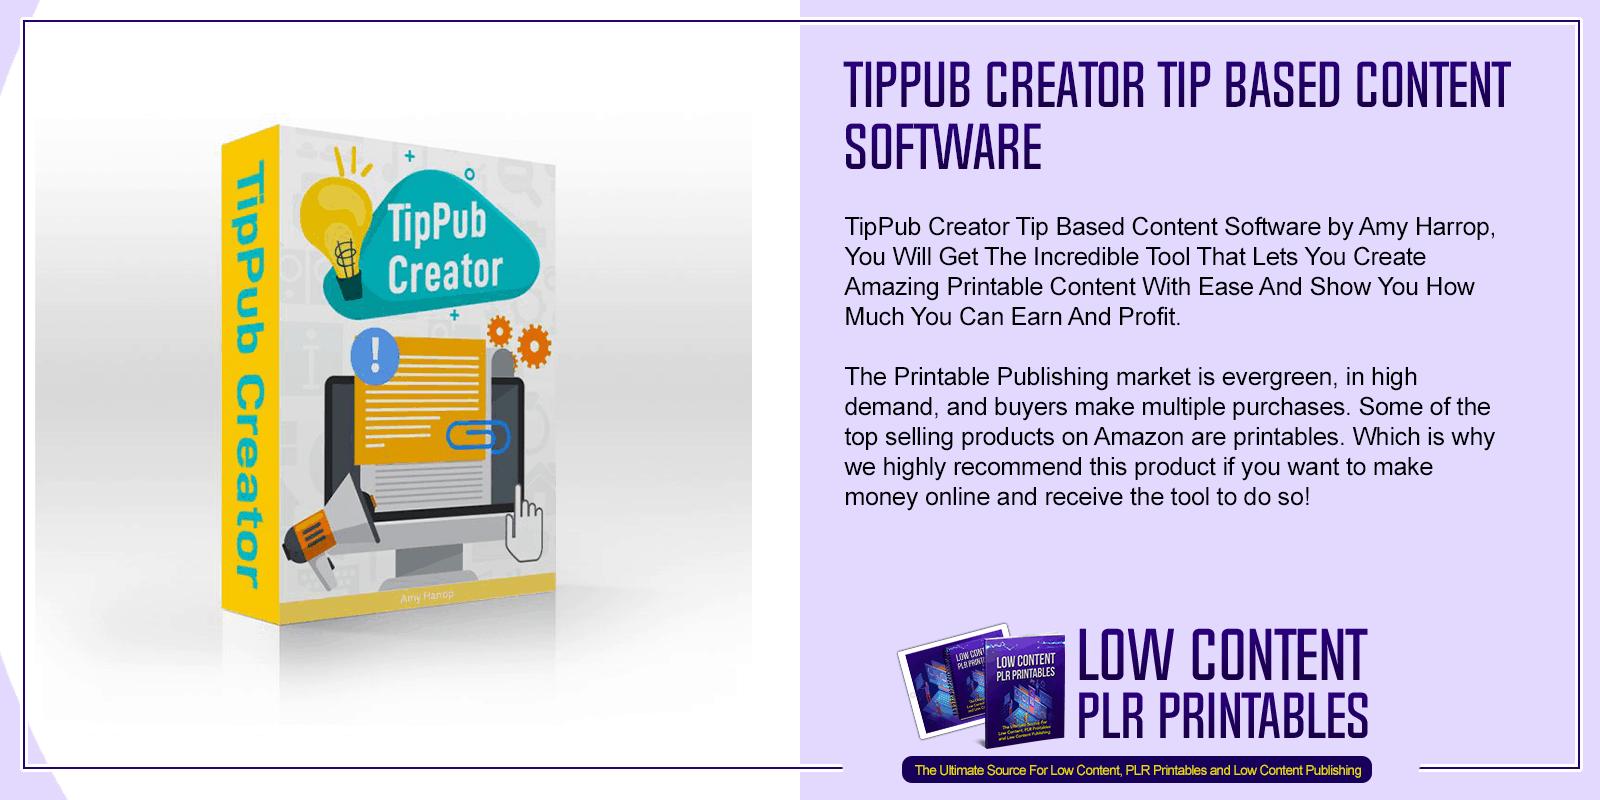 TipPub Creator Tip Based Content Software